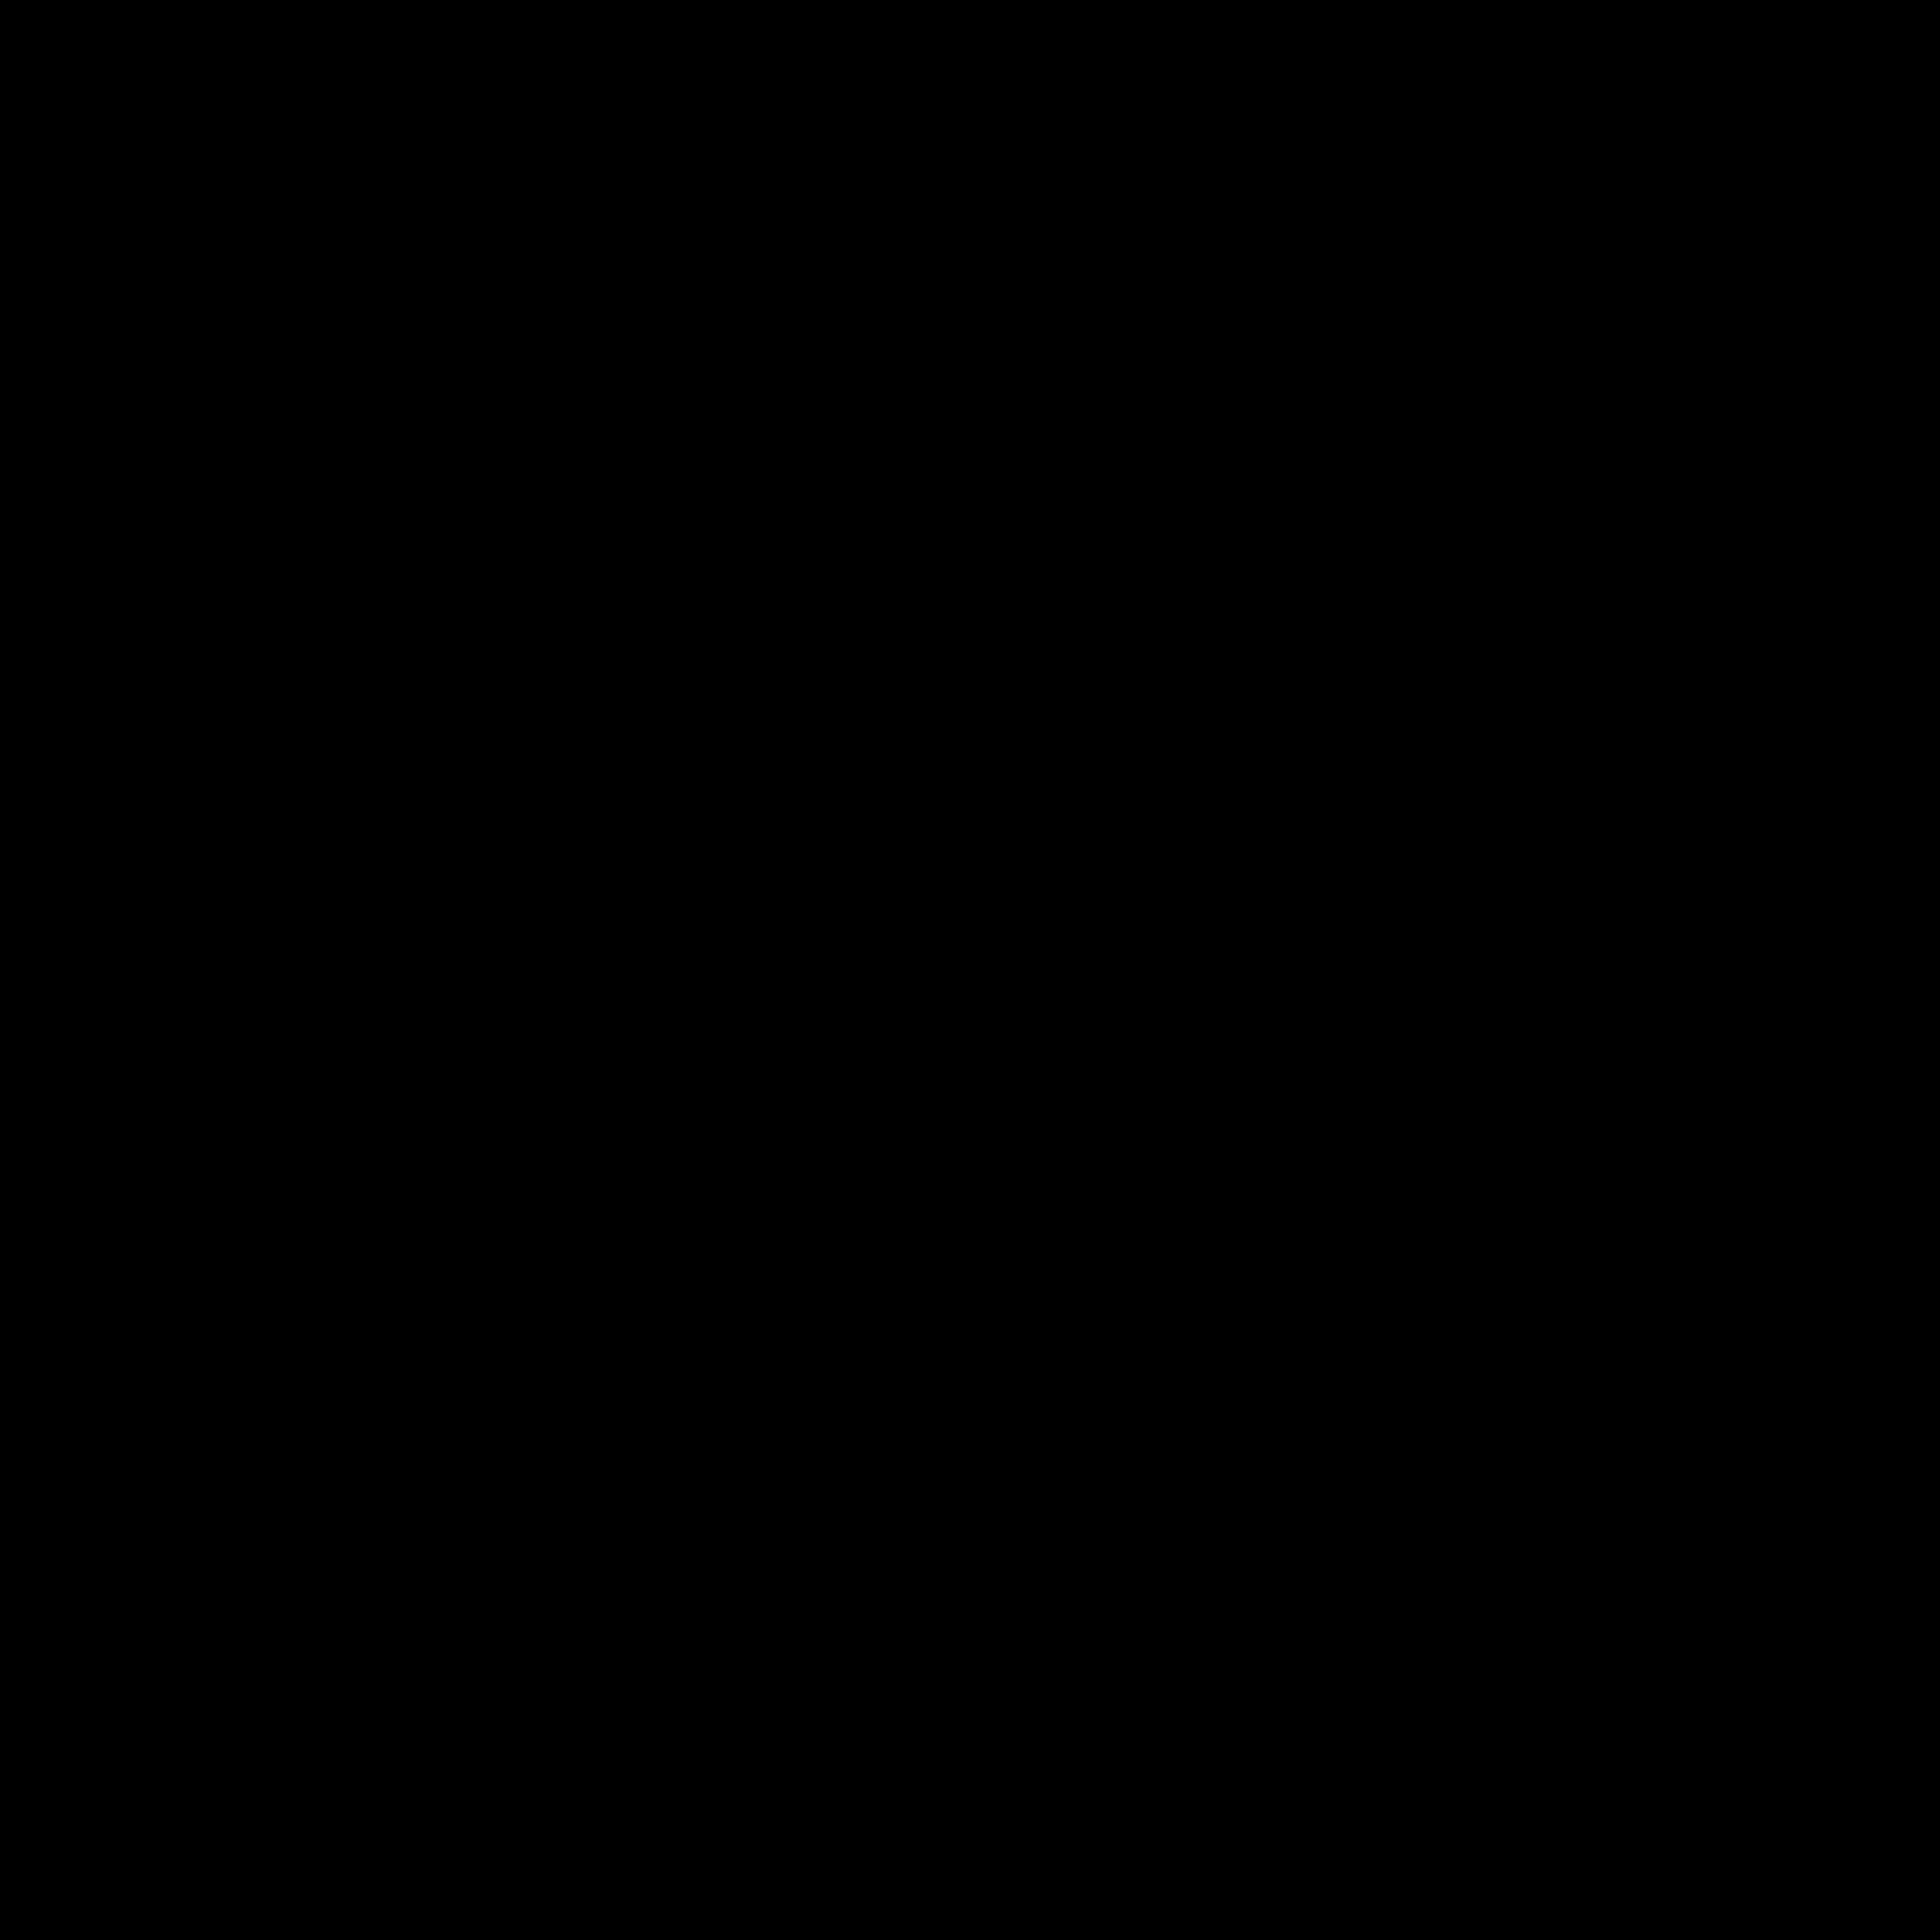 mont-blanc-1-logo-png-transparent.png